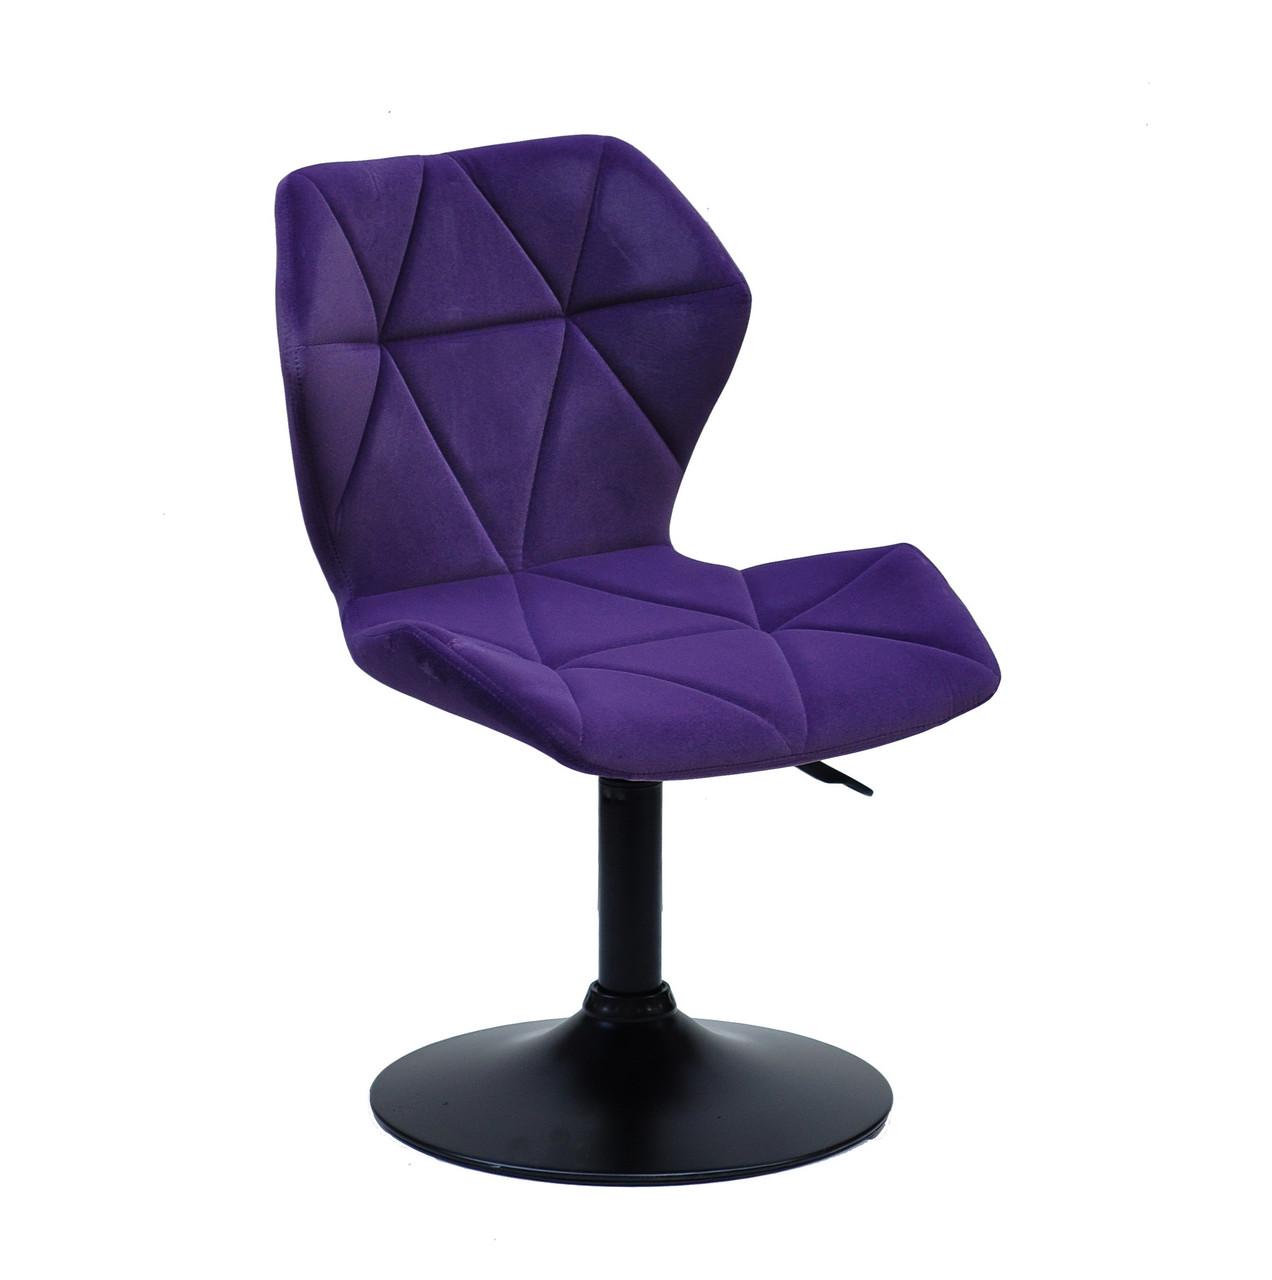 Стул  TORINO  BK- BASE   бархат ,  пурпурный  1013